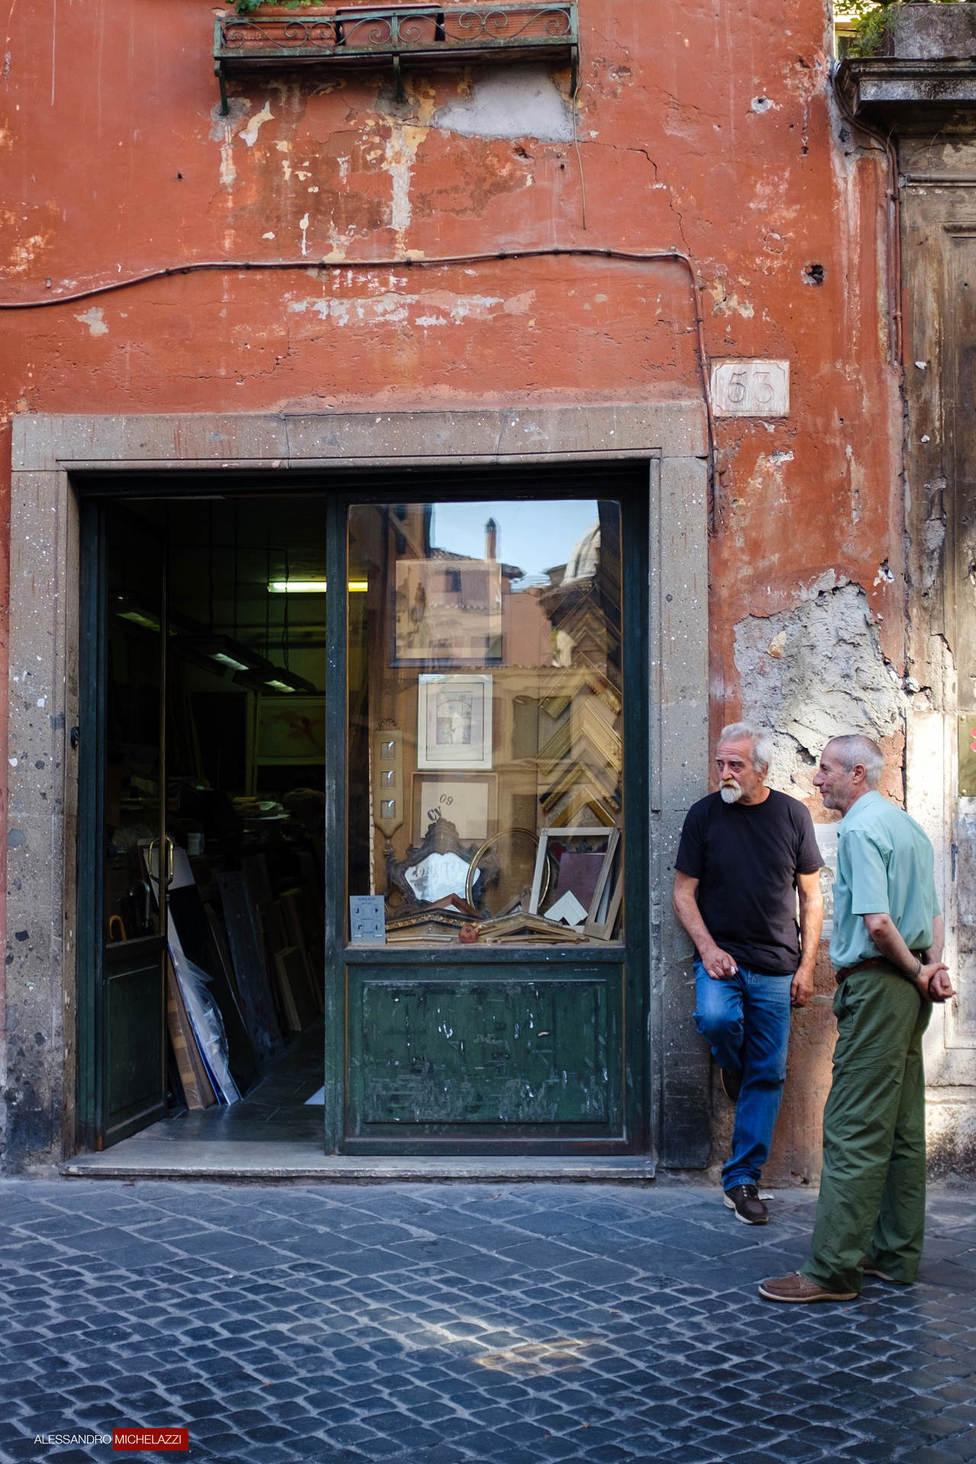 People in Via Margutta